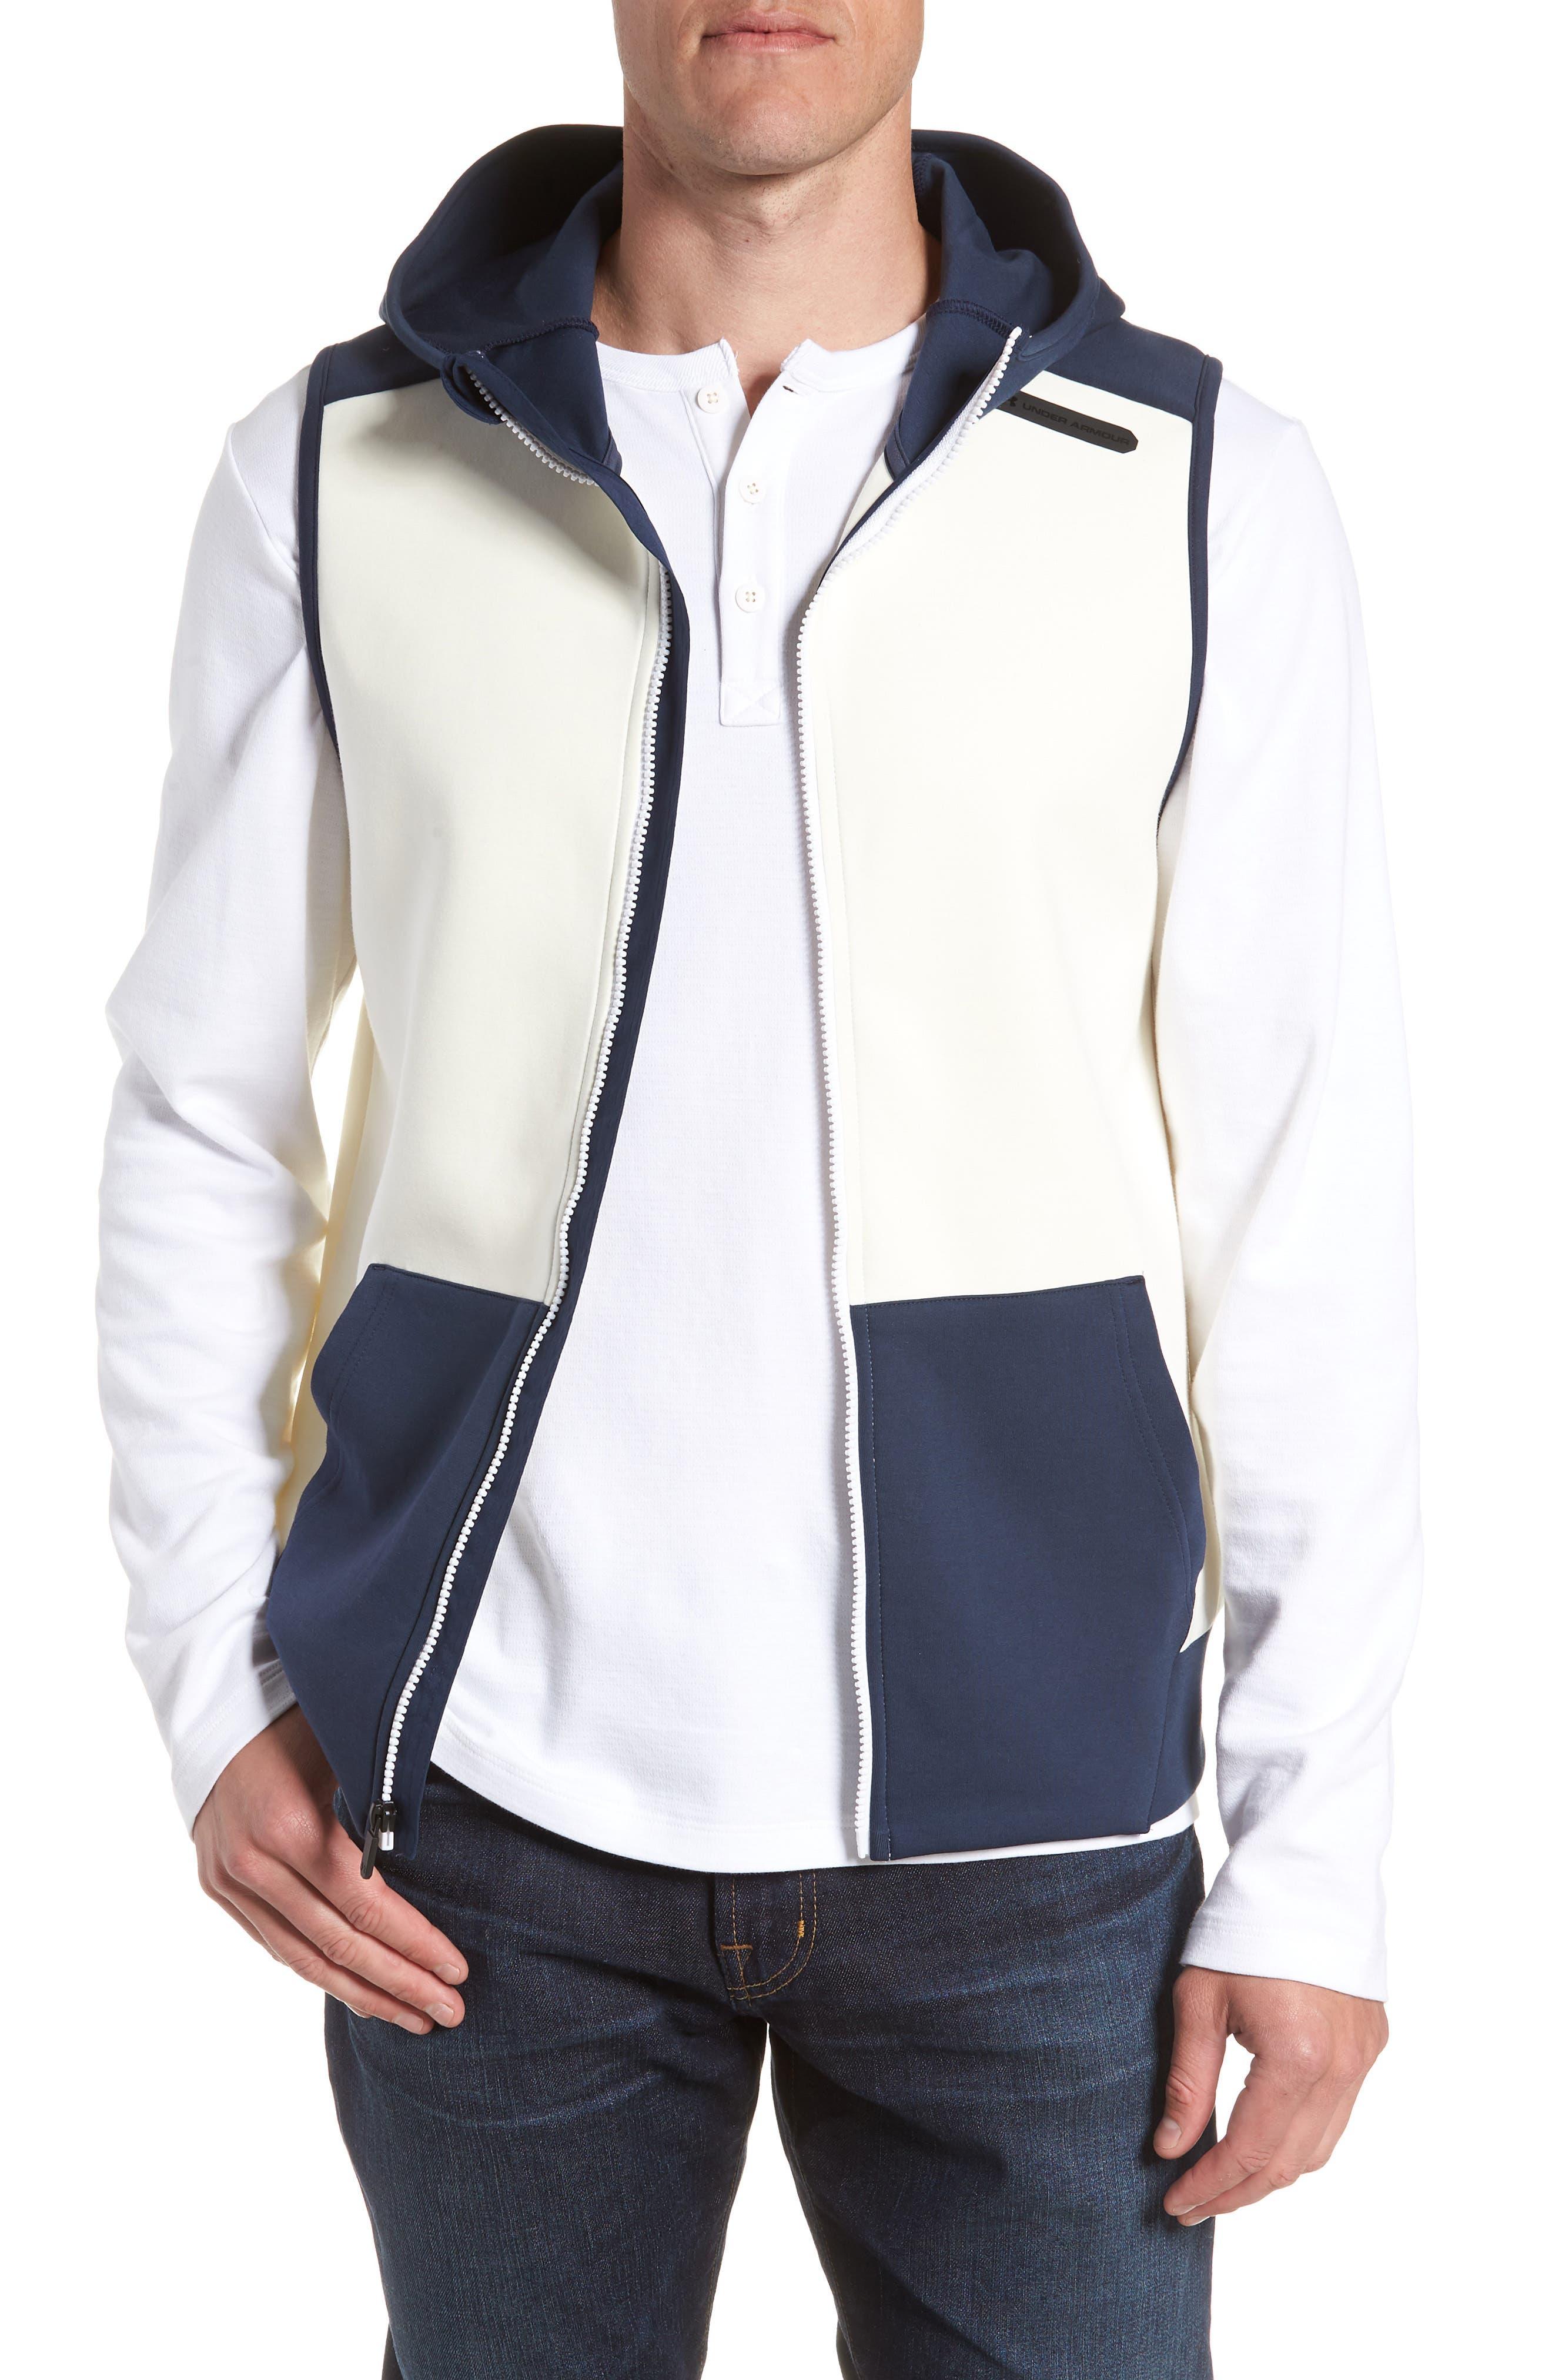 Unstoppable Knit Vest,                         Main,                         color, WHITE / SUMMER NIGHT / BLACK